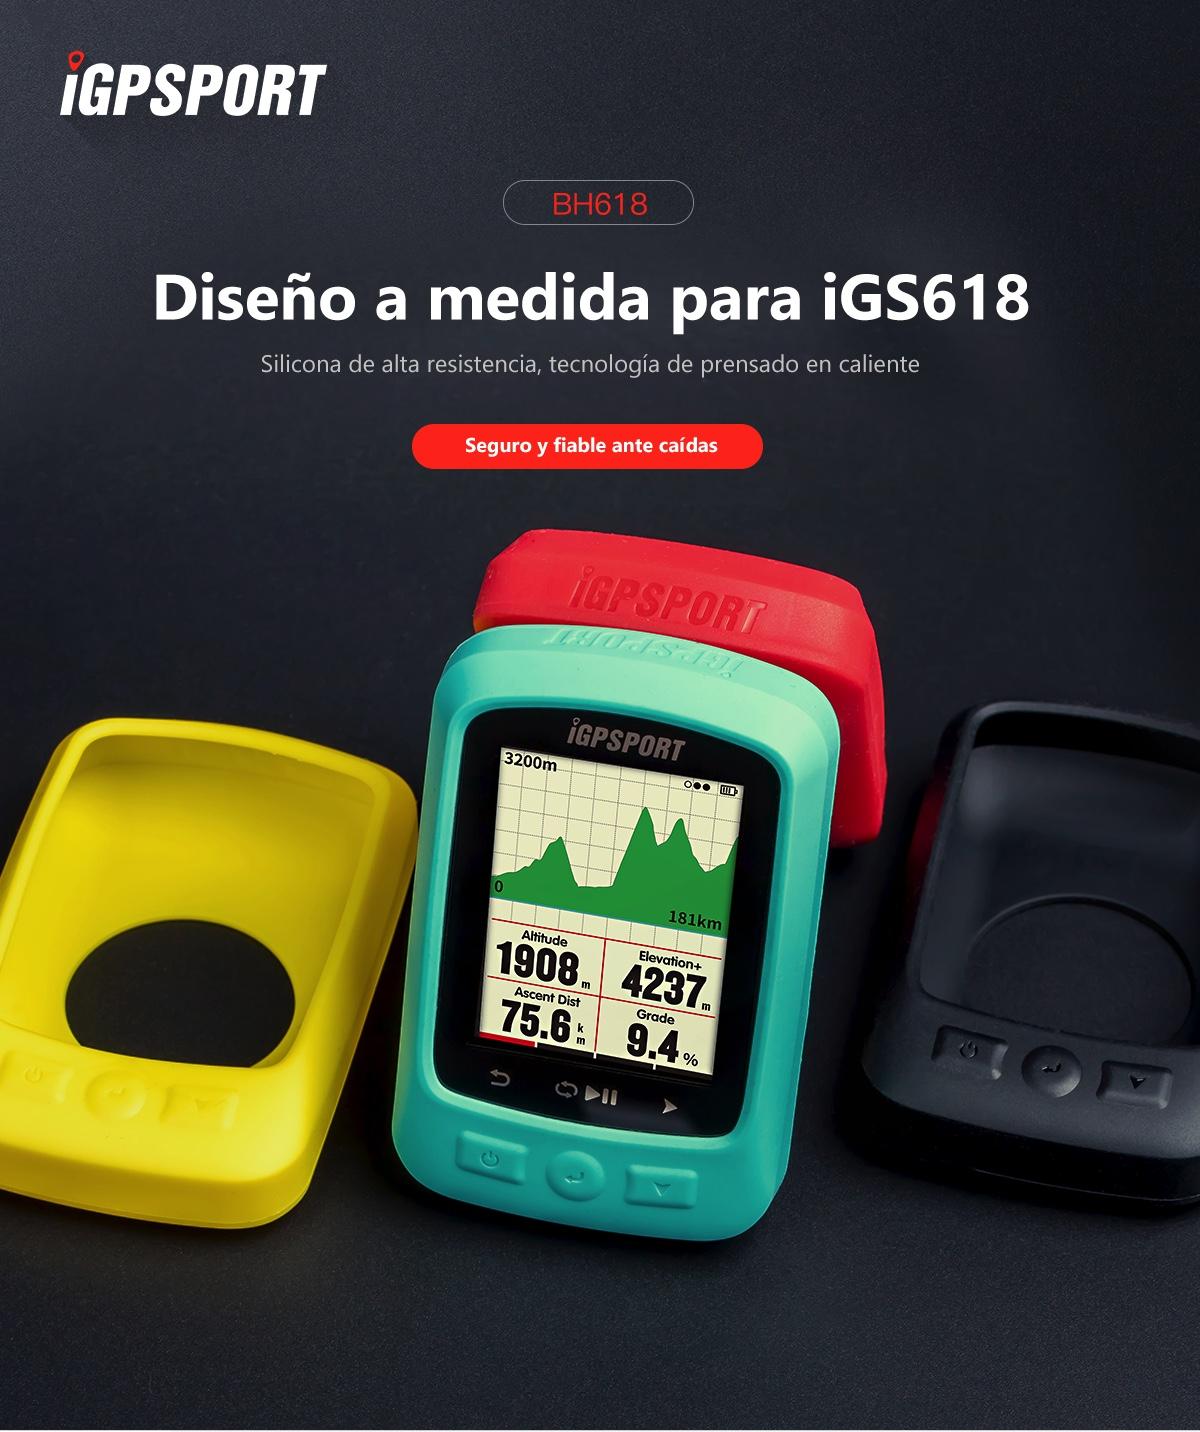 BH618-Spanish_01